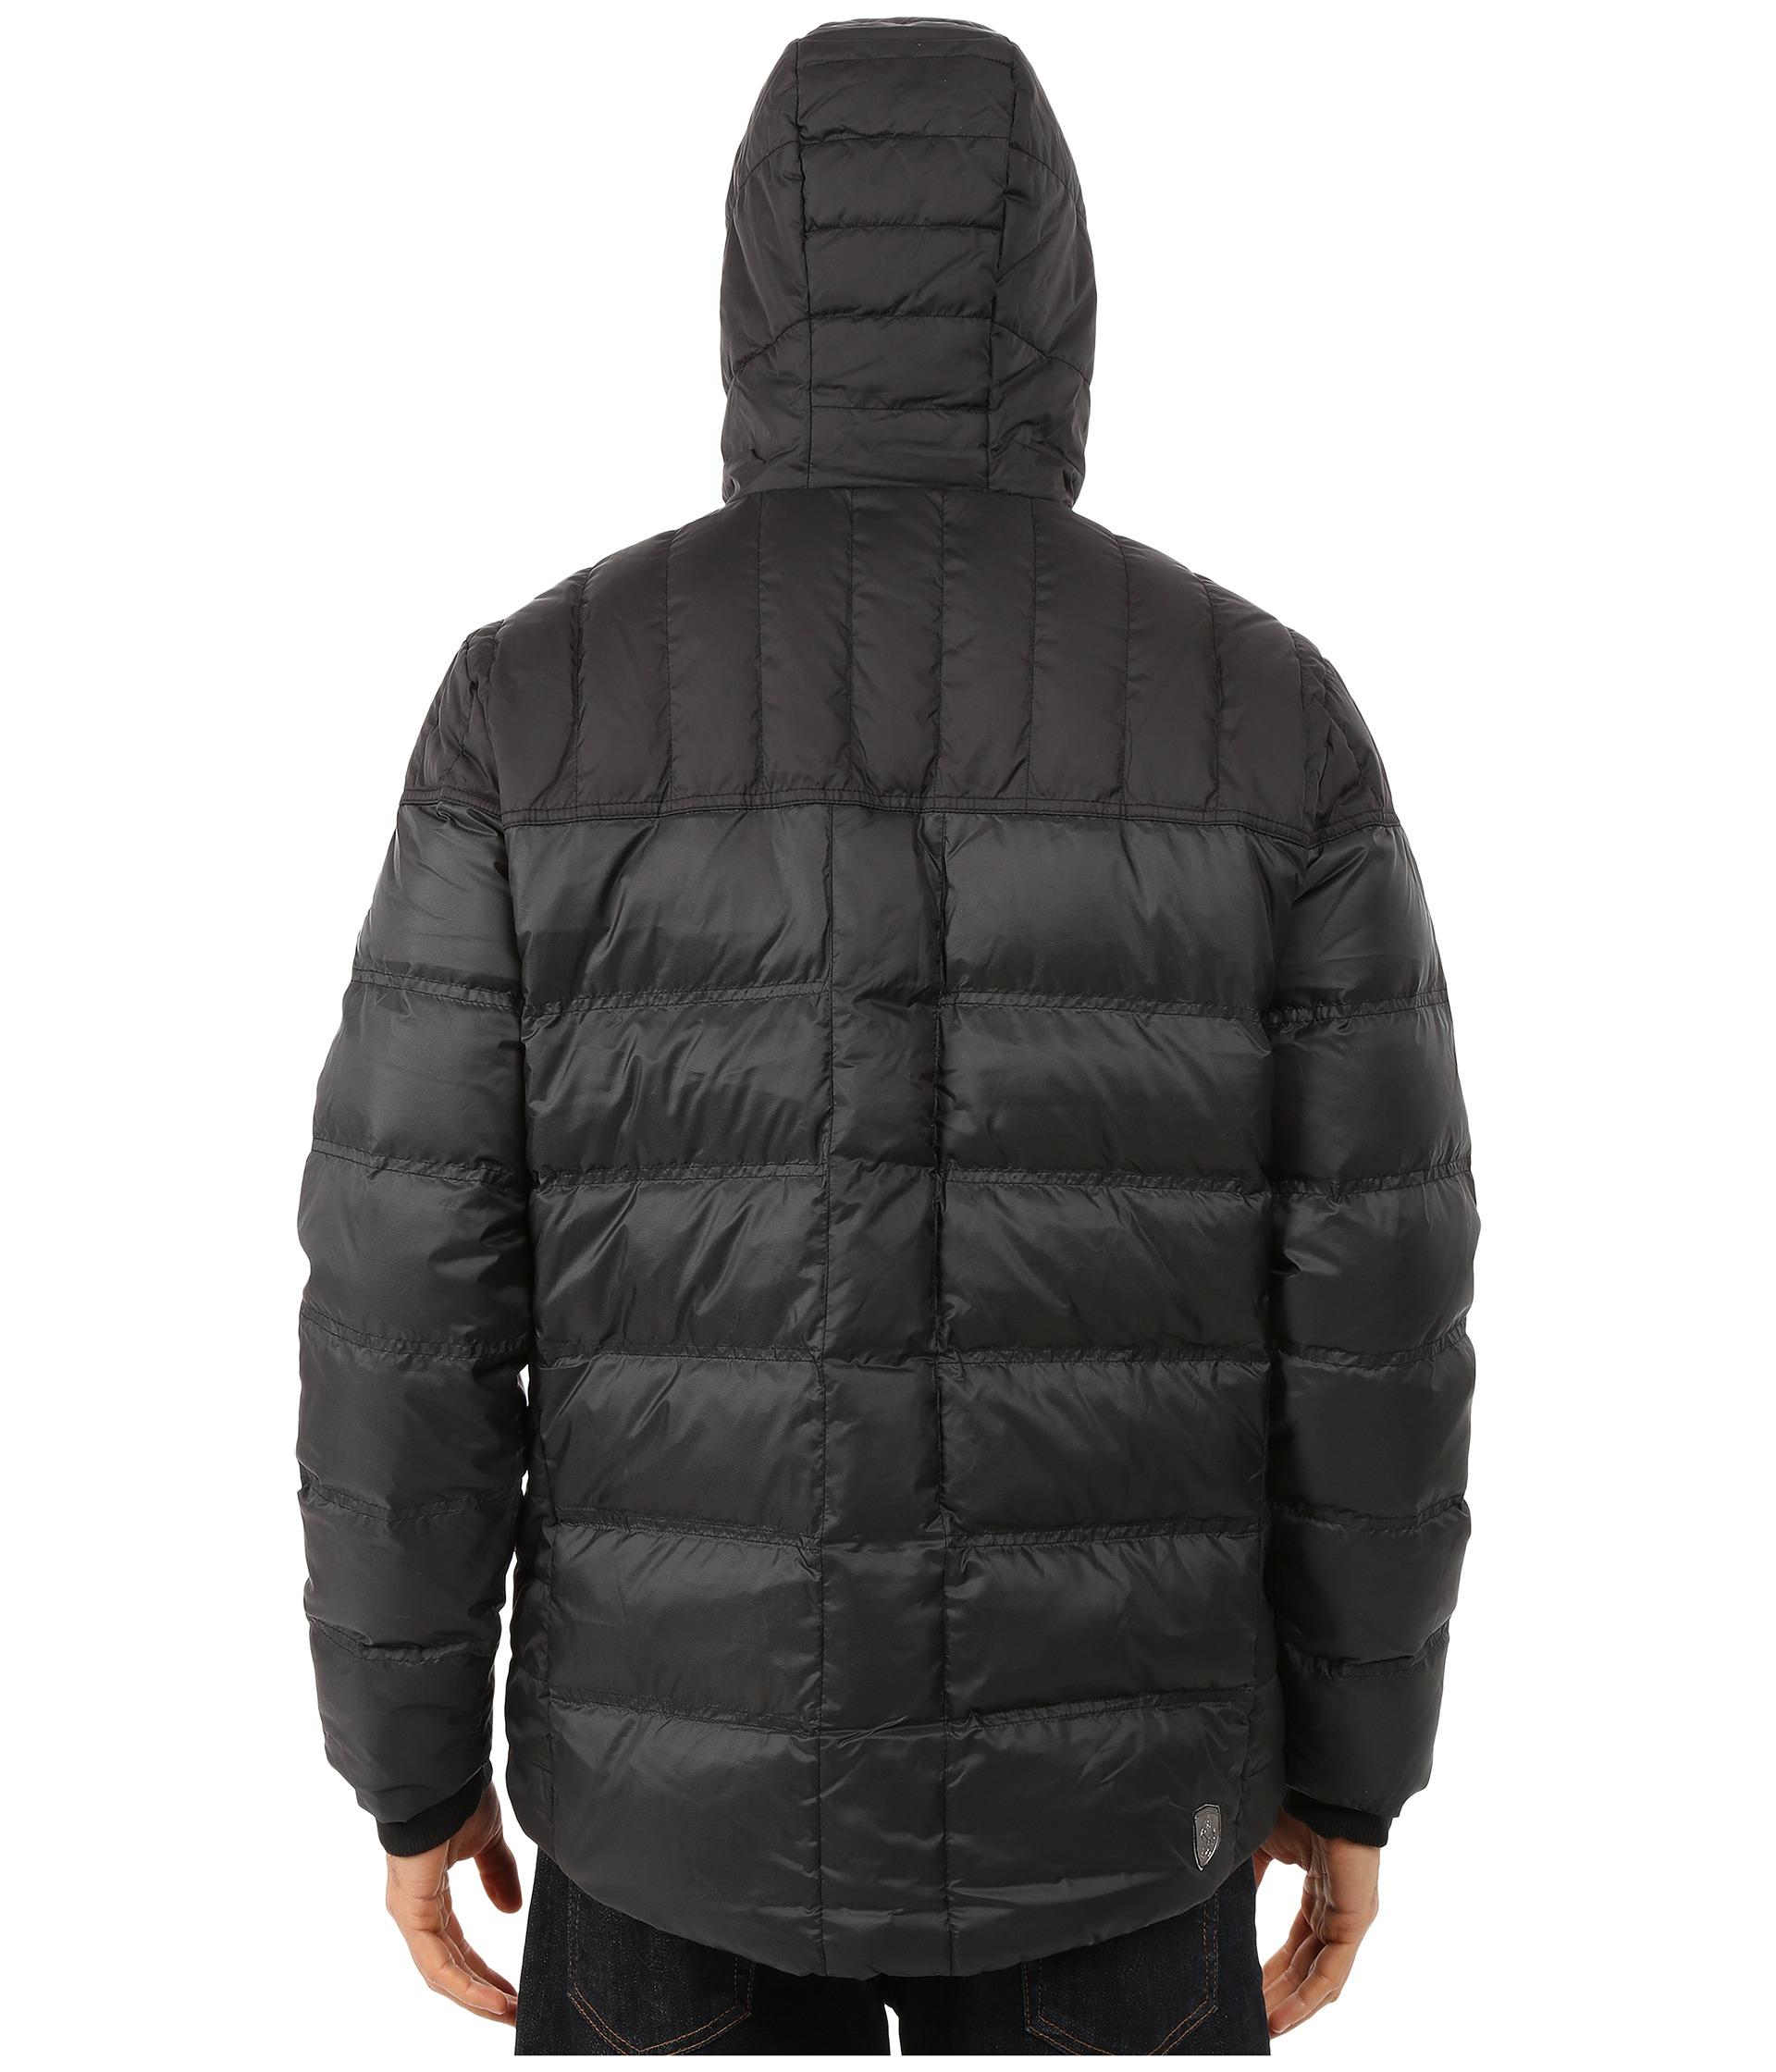 jacket discount pants lrg gray puma track men softshell ferrari big heather light p